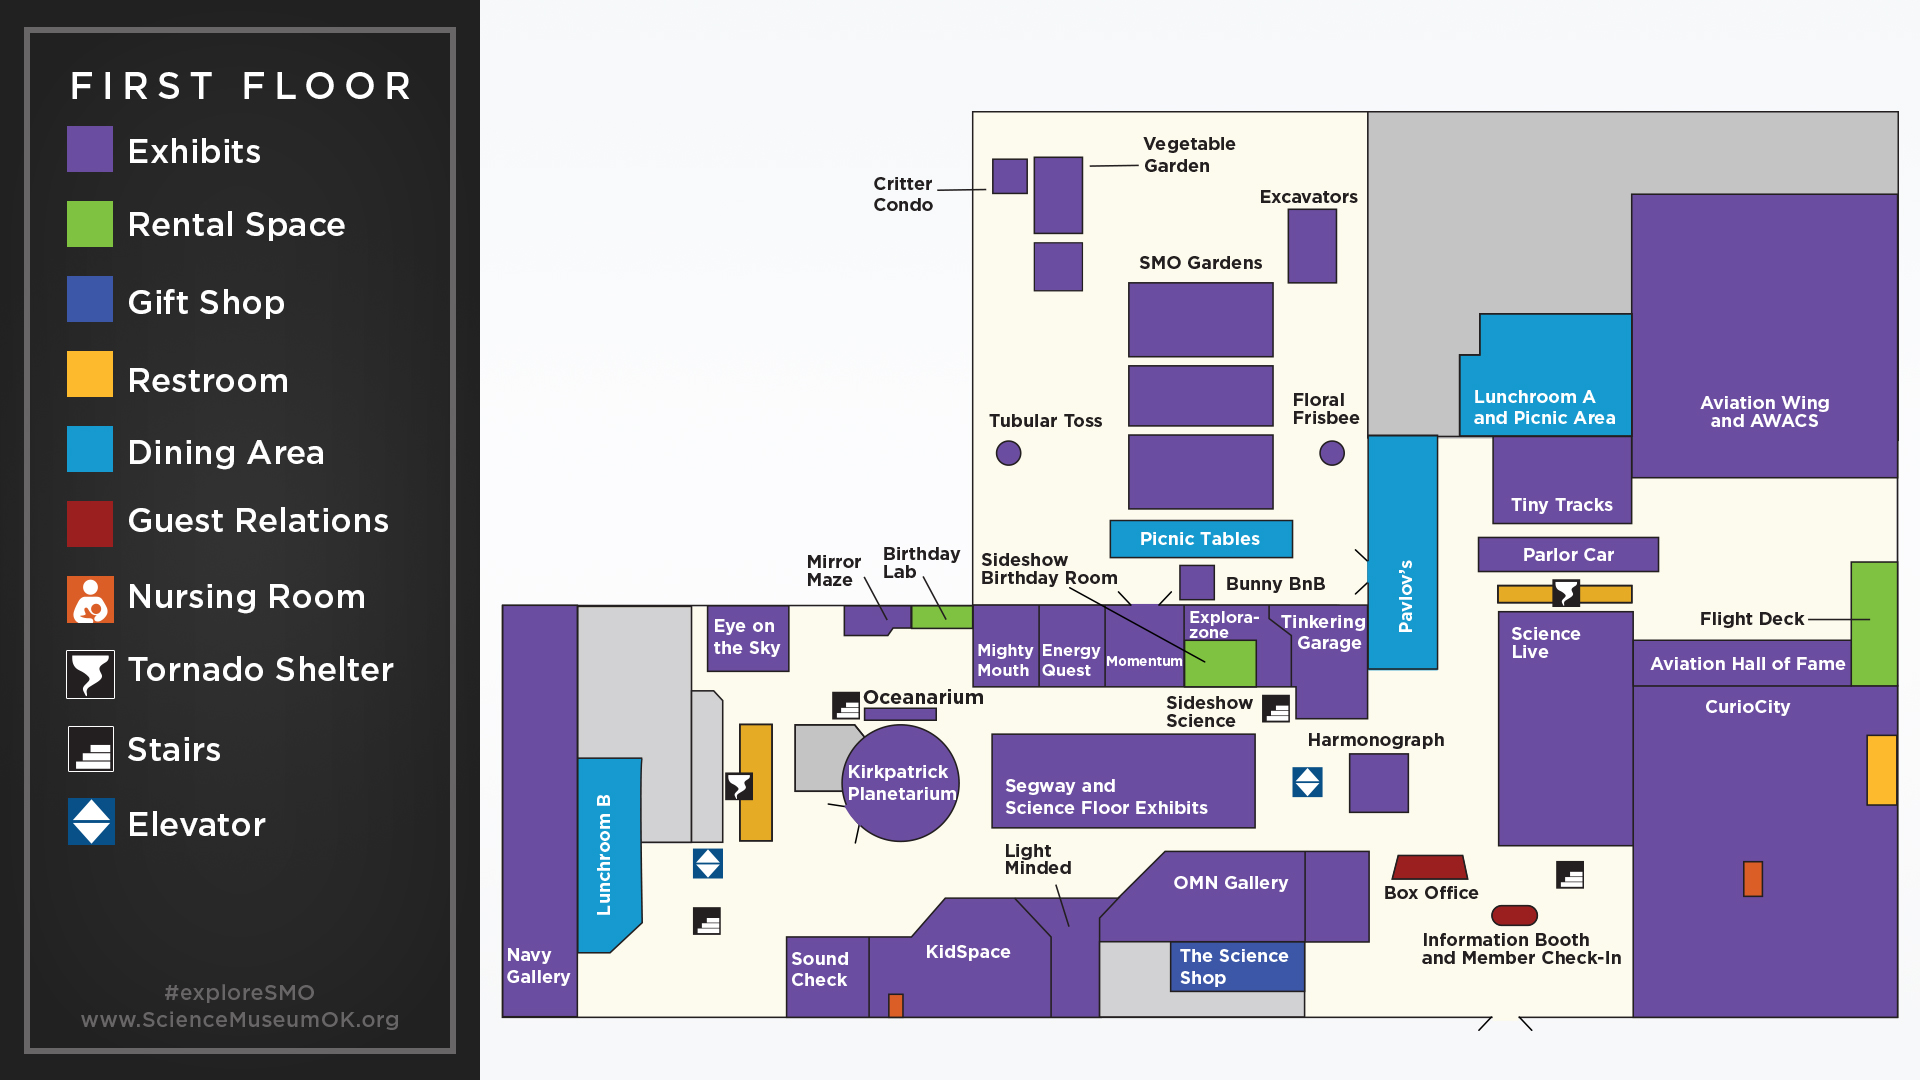 Museum Map | Science Museum Oklahoma on laumeier sculpture park map, forest park map, st louis science center map, airport map, navy pier map, soulard neighborhood map, saint louis university map, scottrade center map,